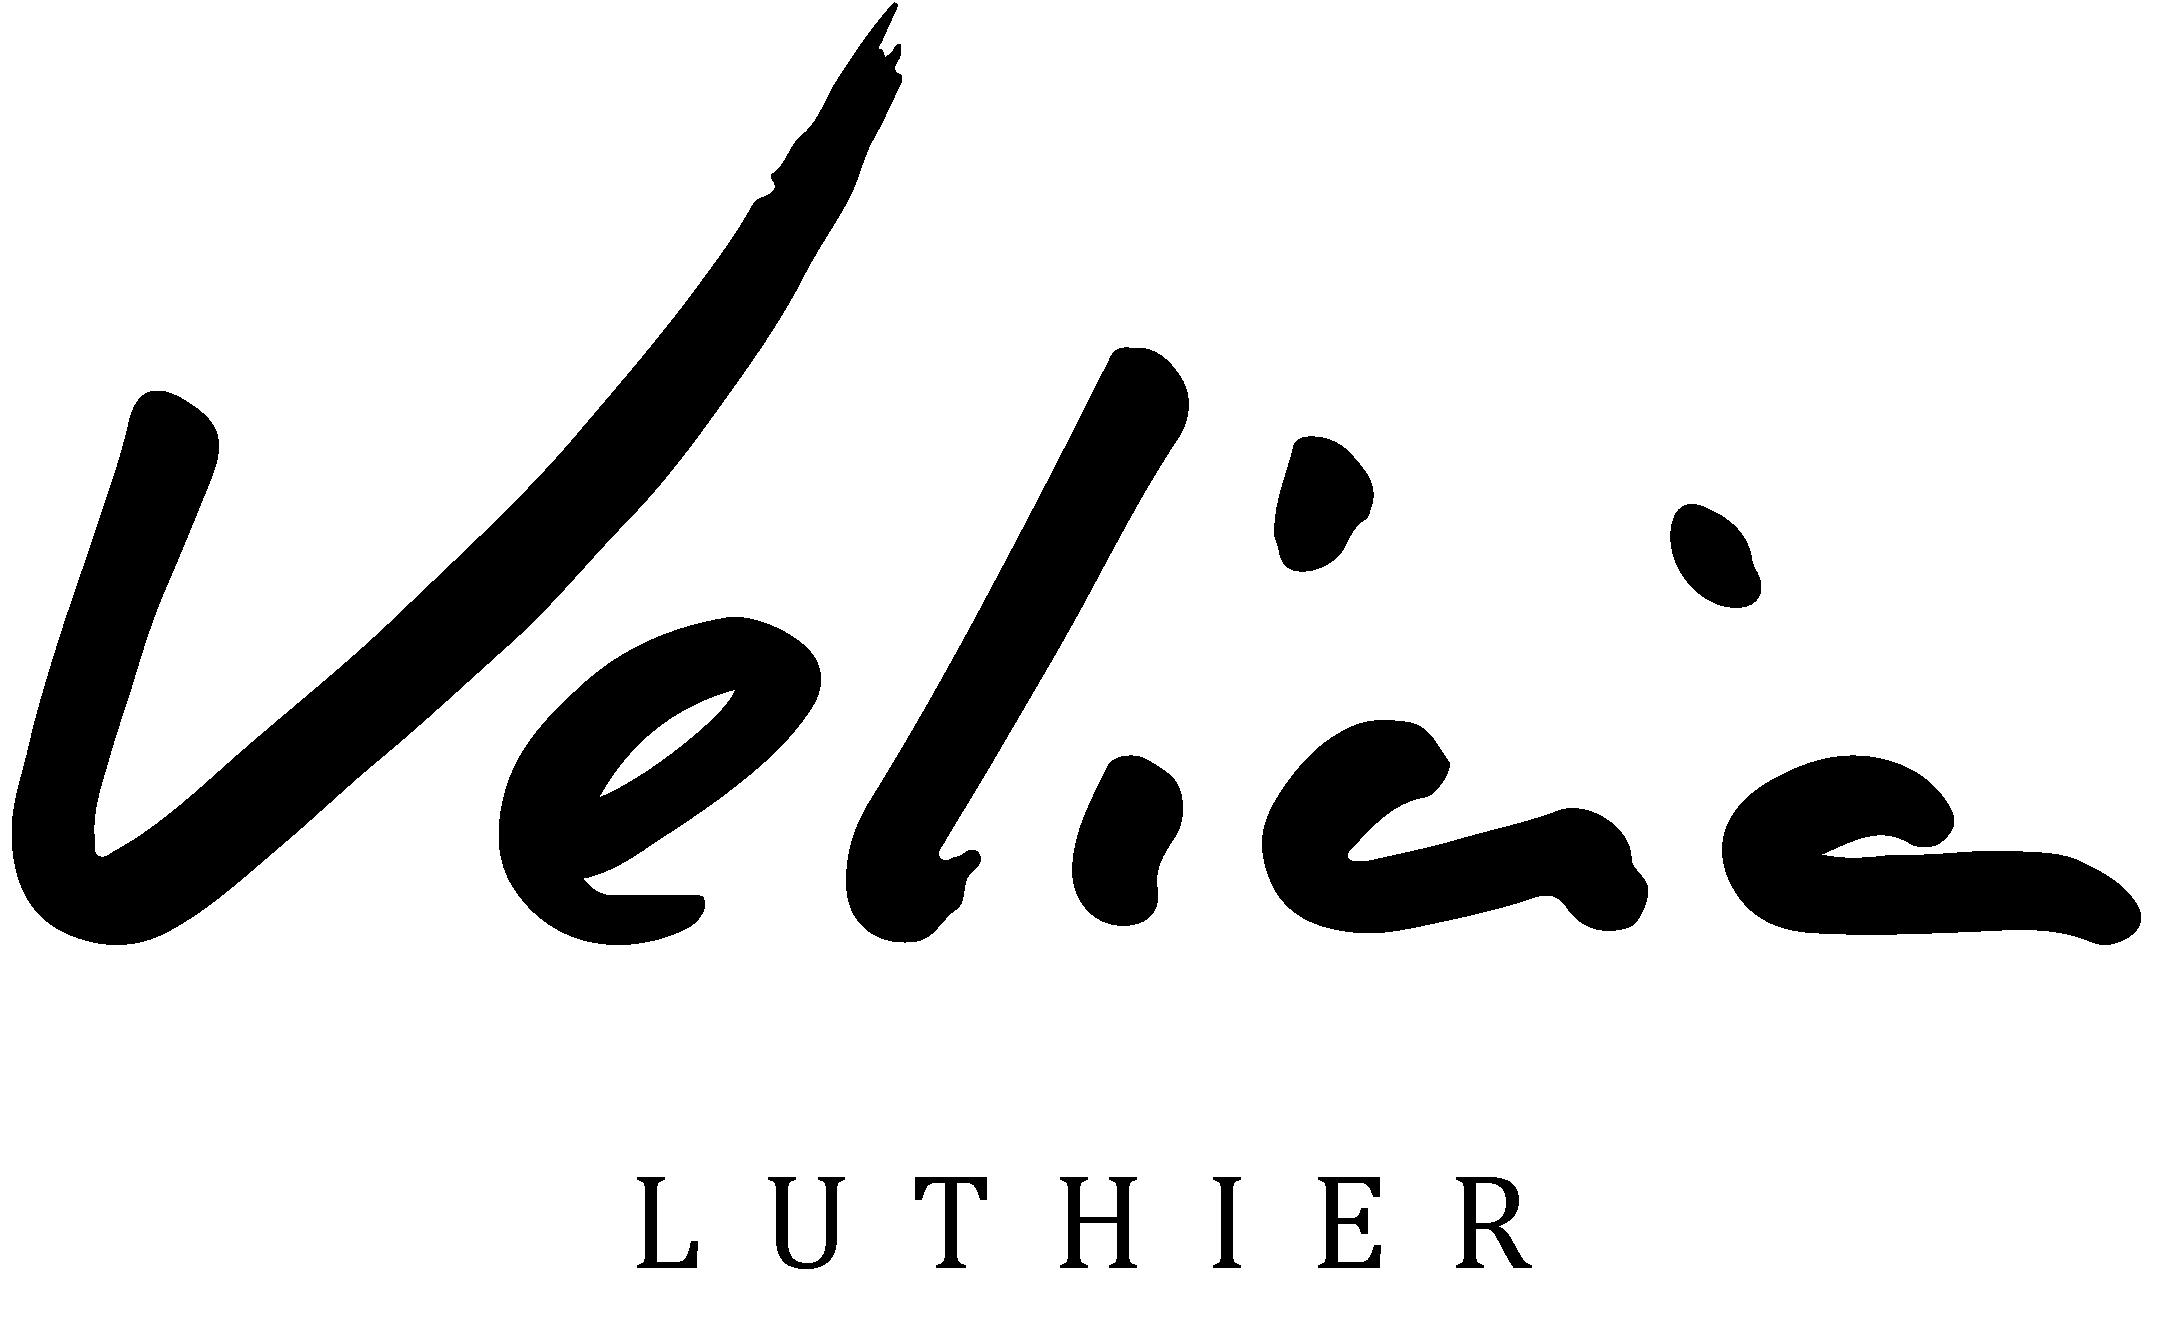 luthier valladolid log transpa